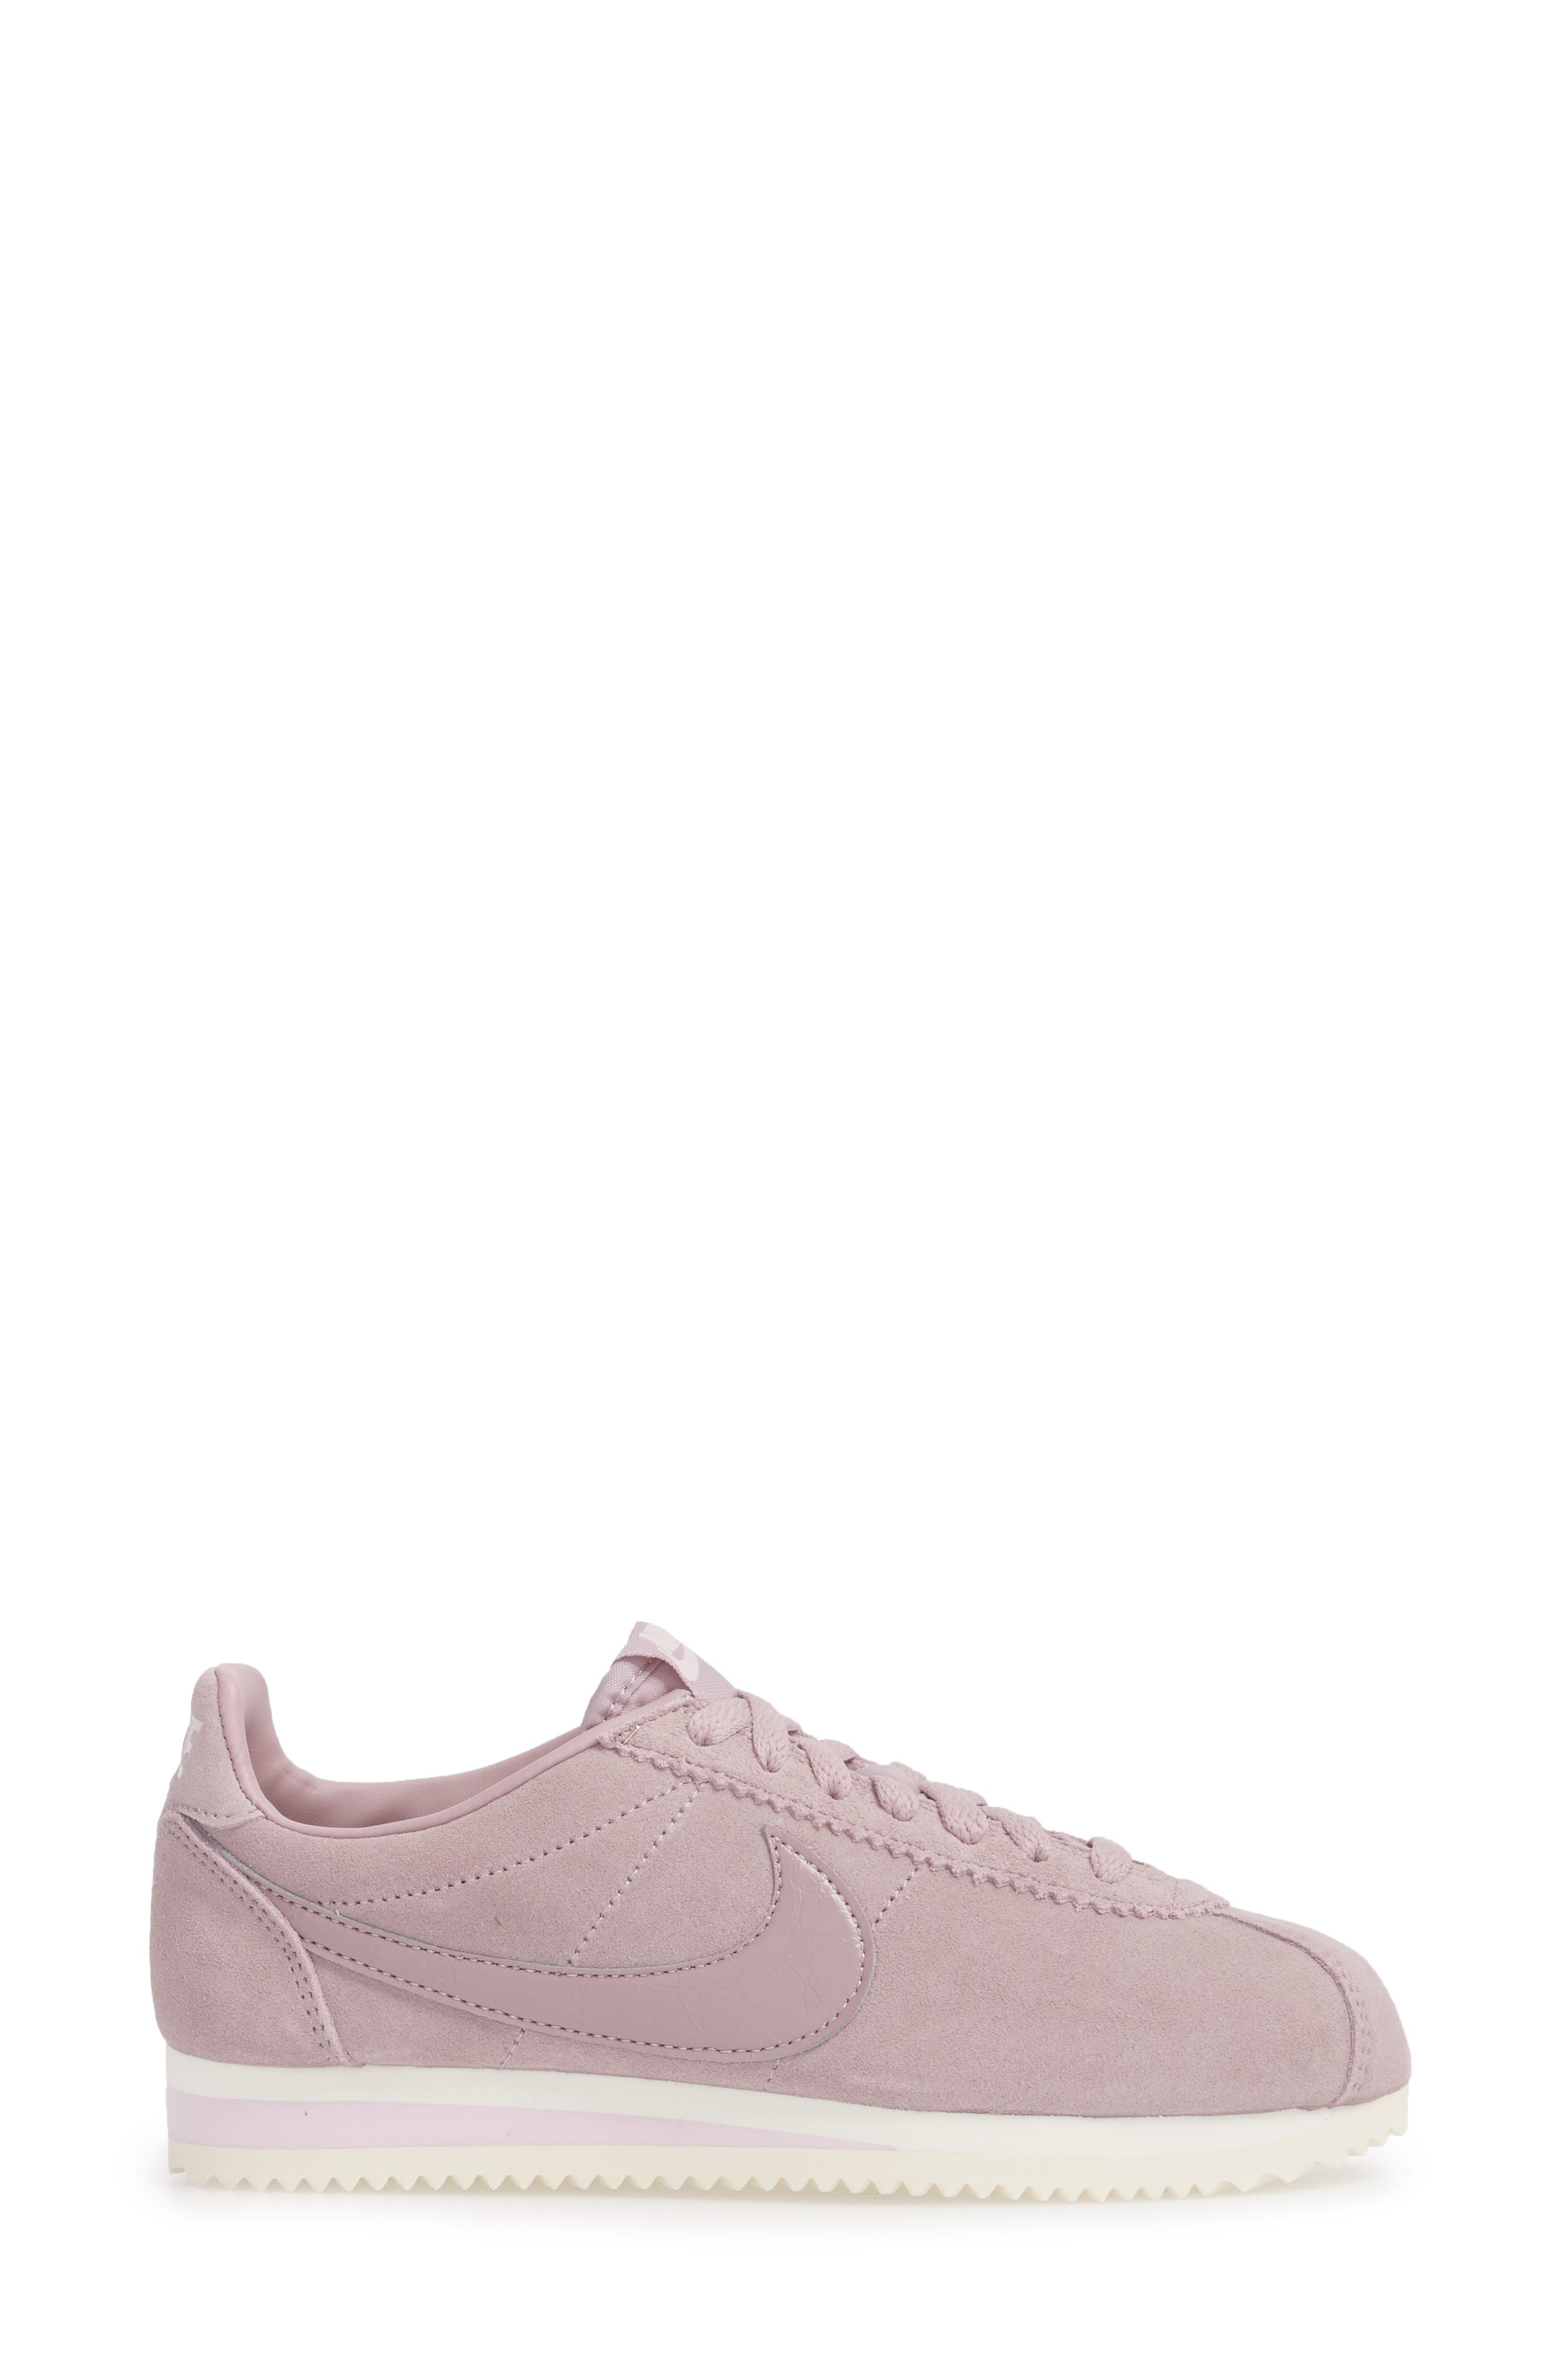 Classic Cortez Suede Sneaker,                             Alternate thumbnail 3, color,                             Elemental Rose/ Elemental Rose